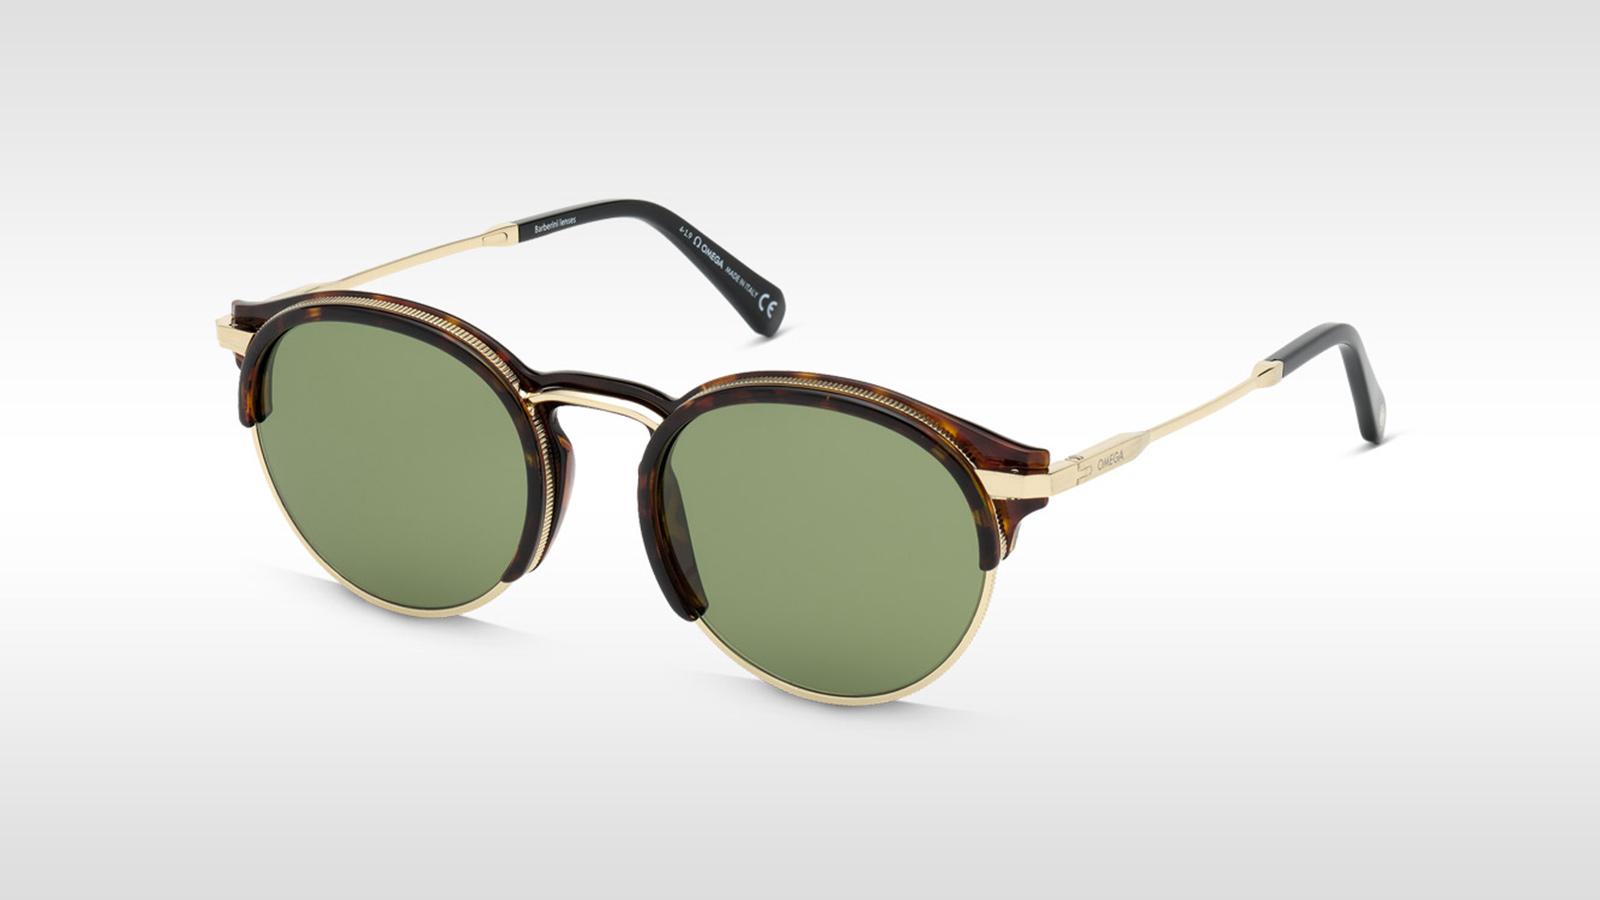 Omega Eyewear Collection